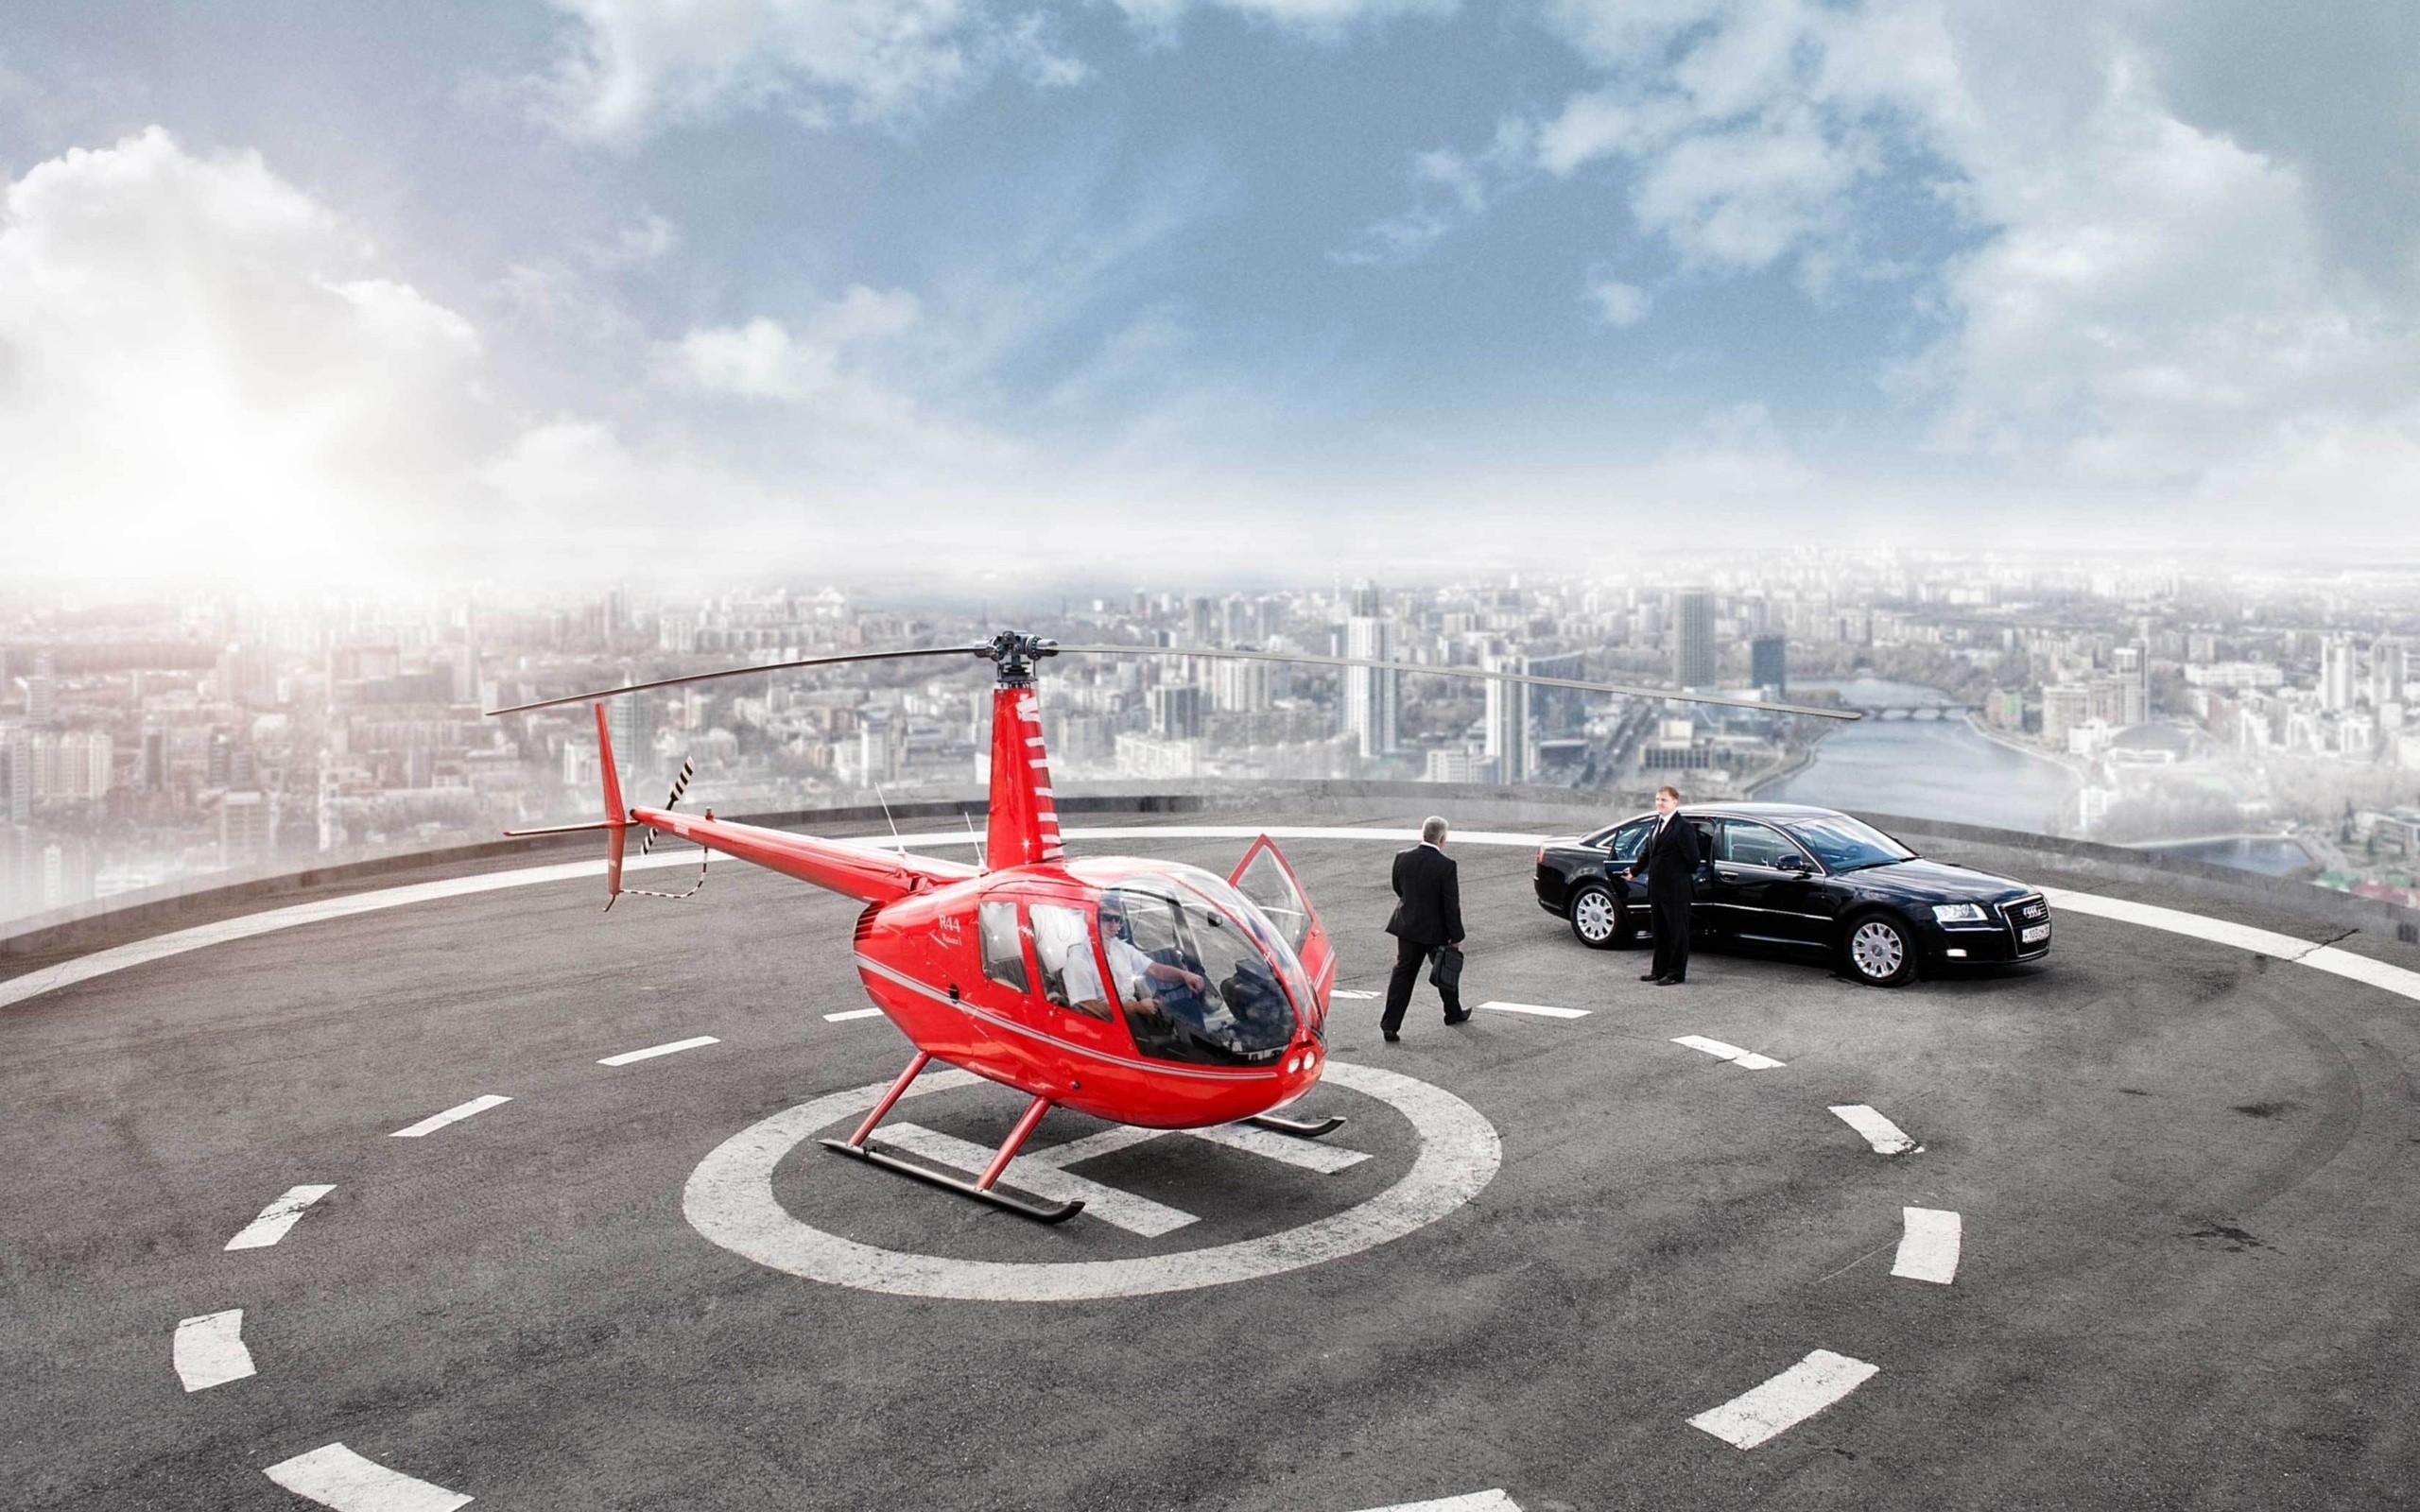 Helicóptero en rascacielos - 2560x1600